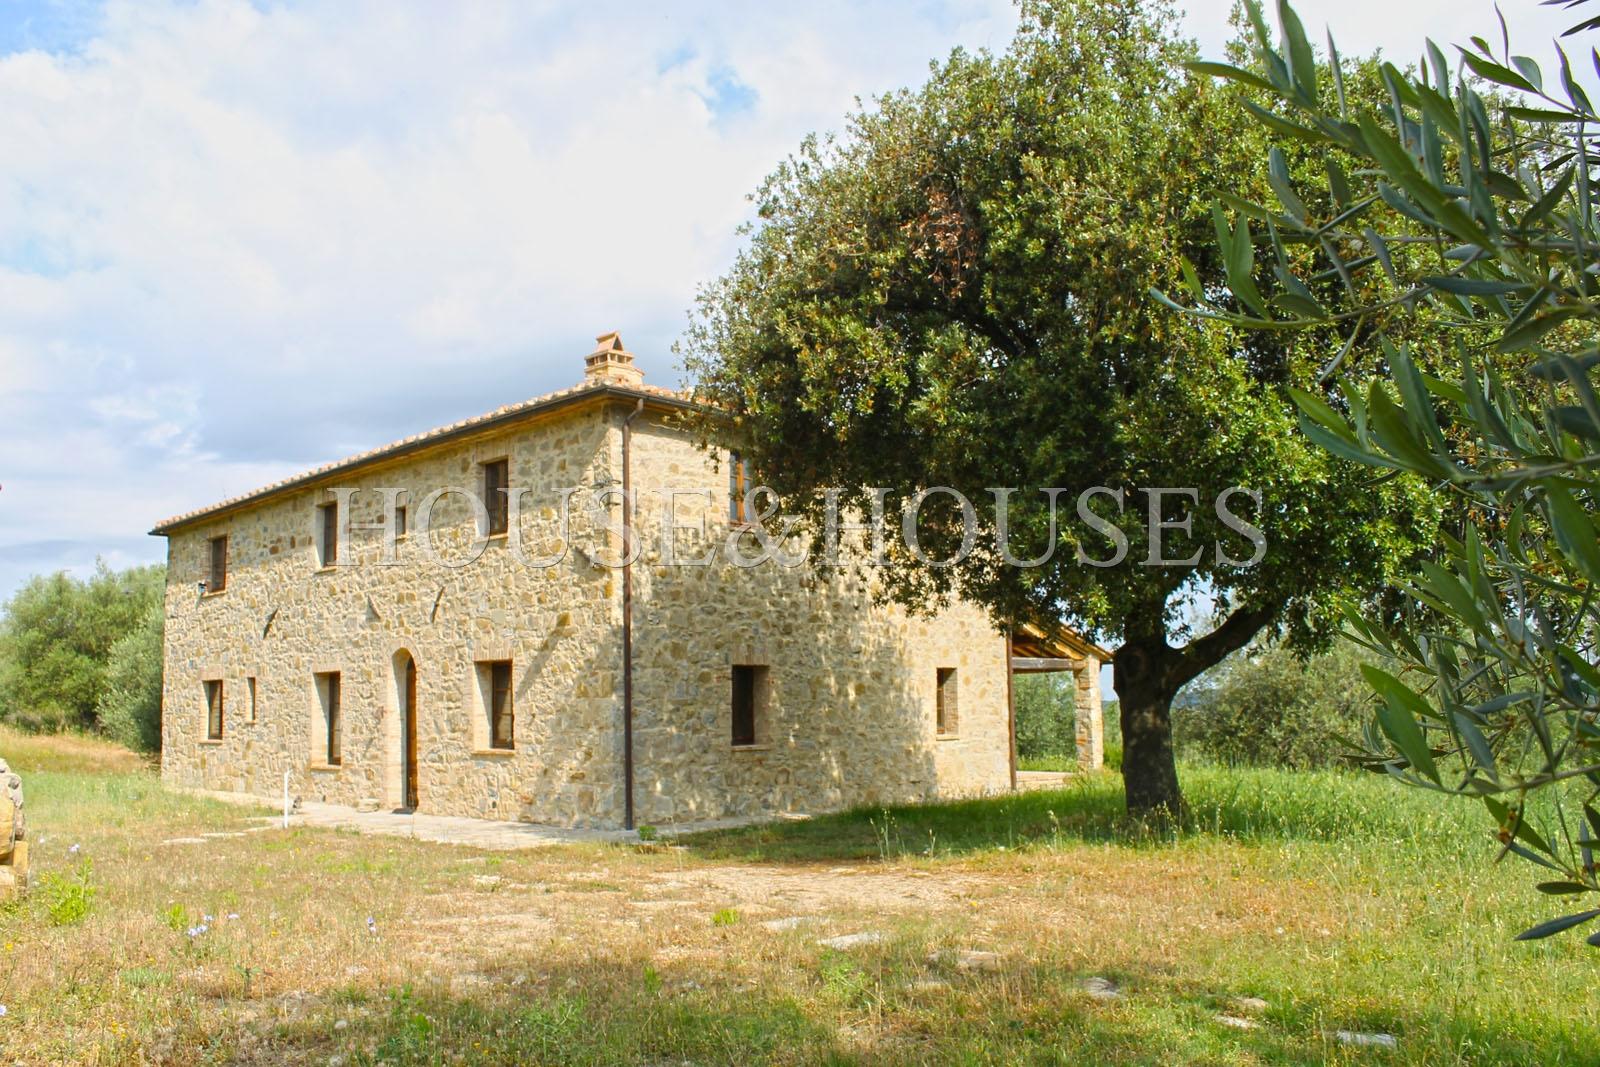 Toscana grosseto seggiano in vendita casale - Casale in toscana ...